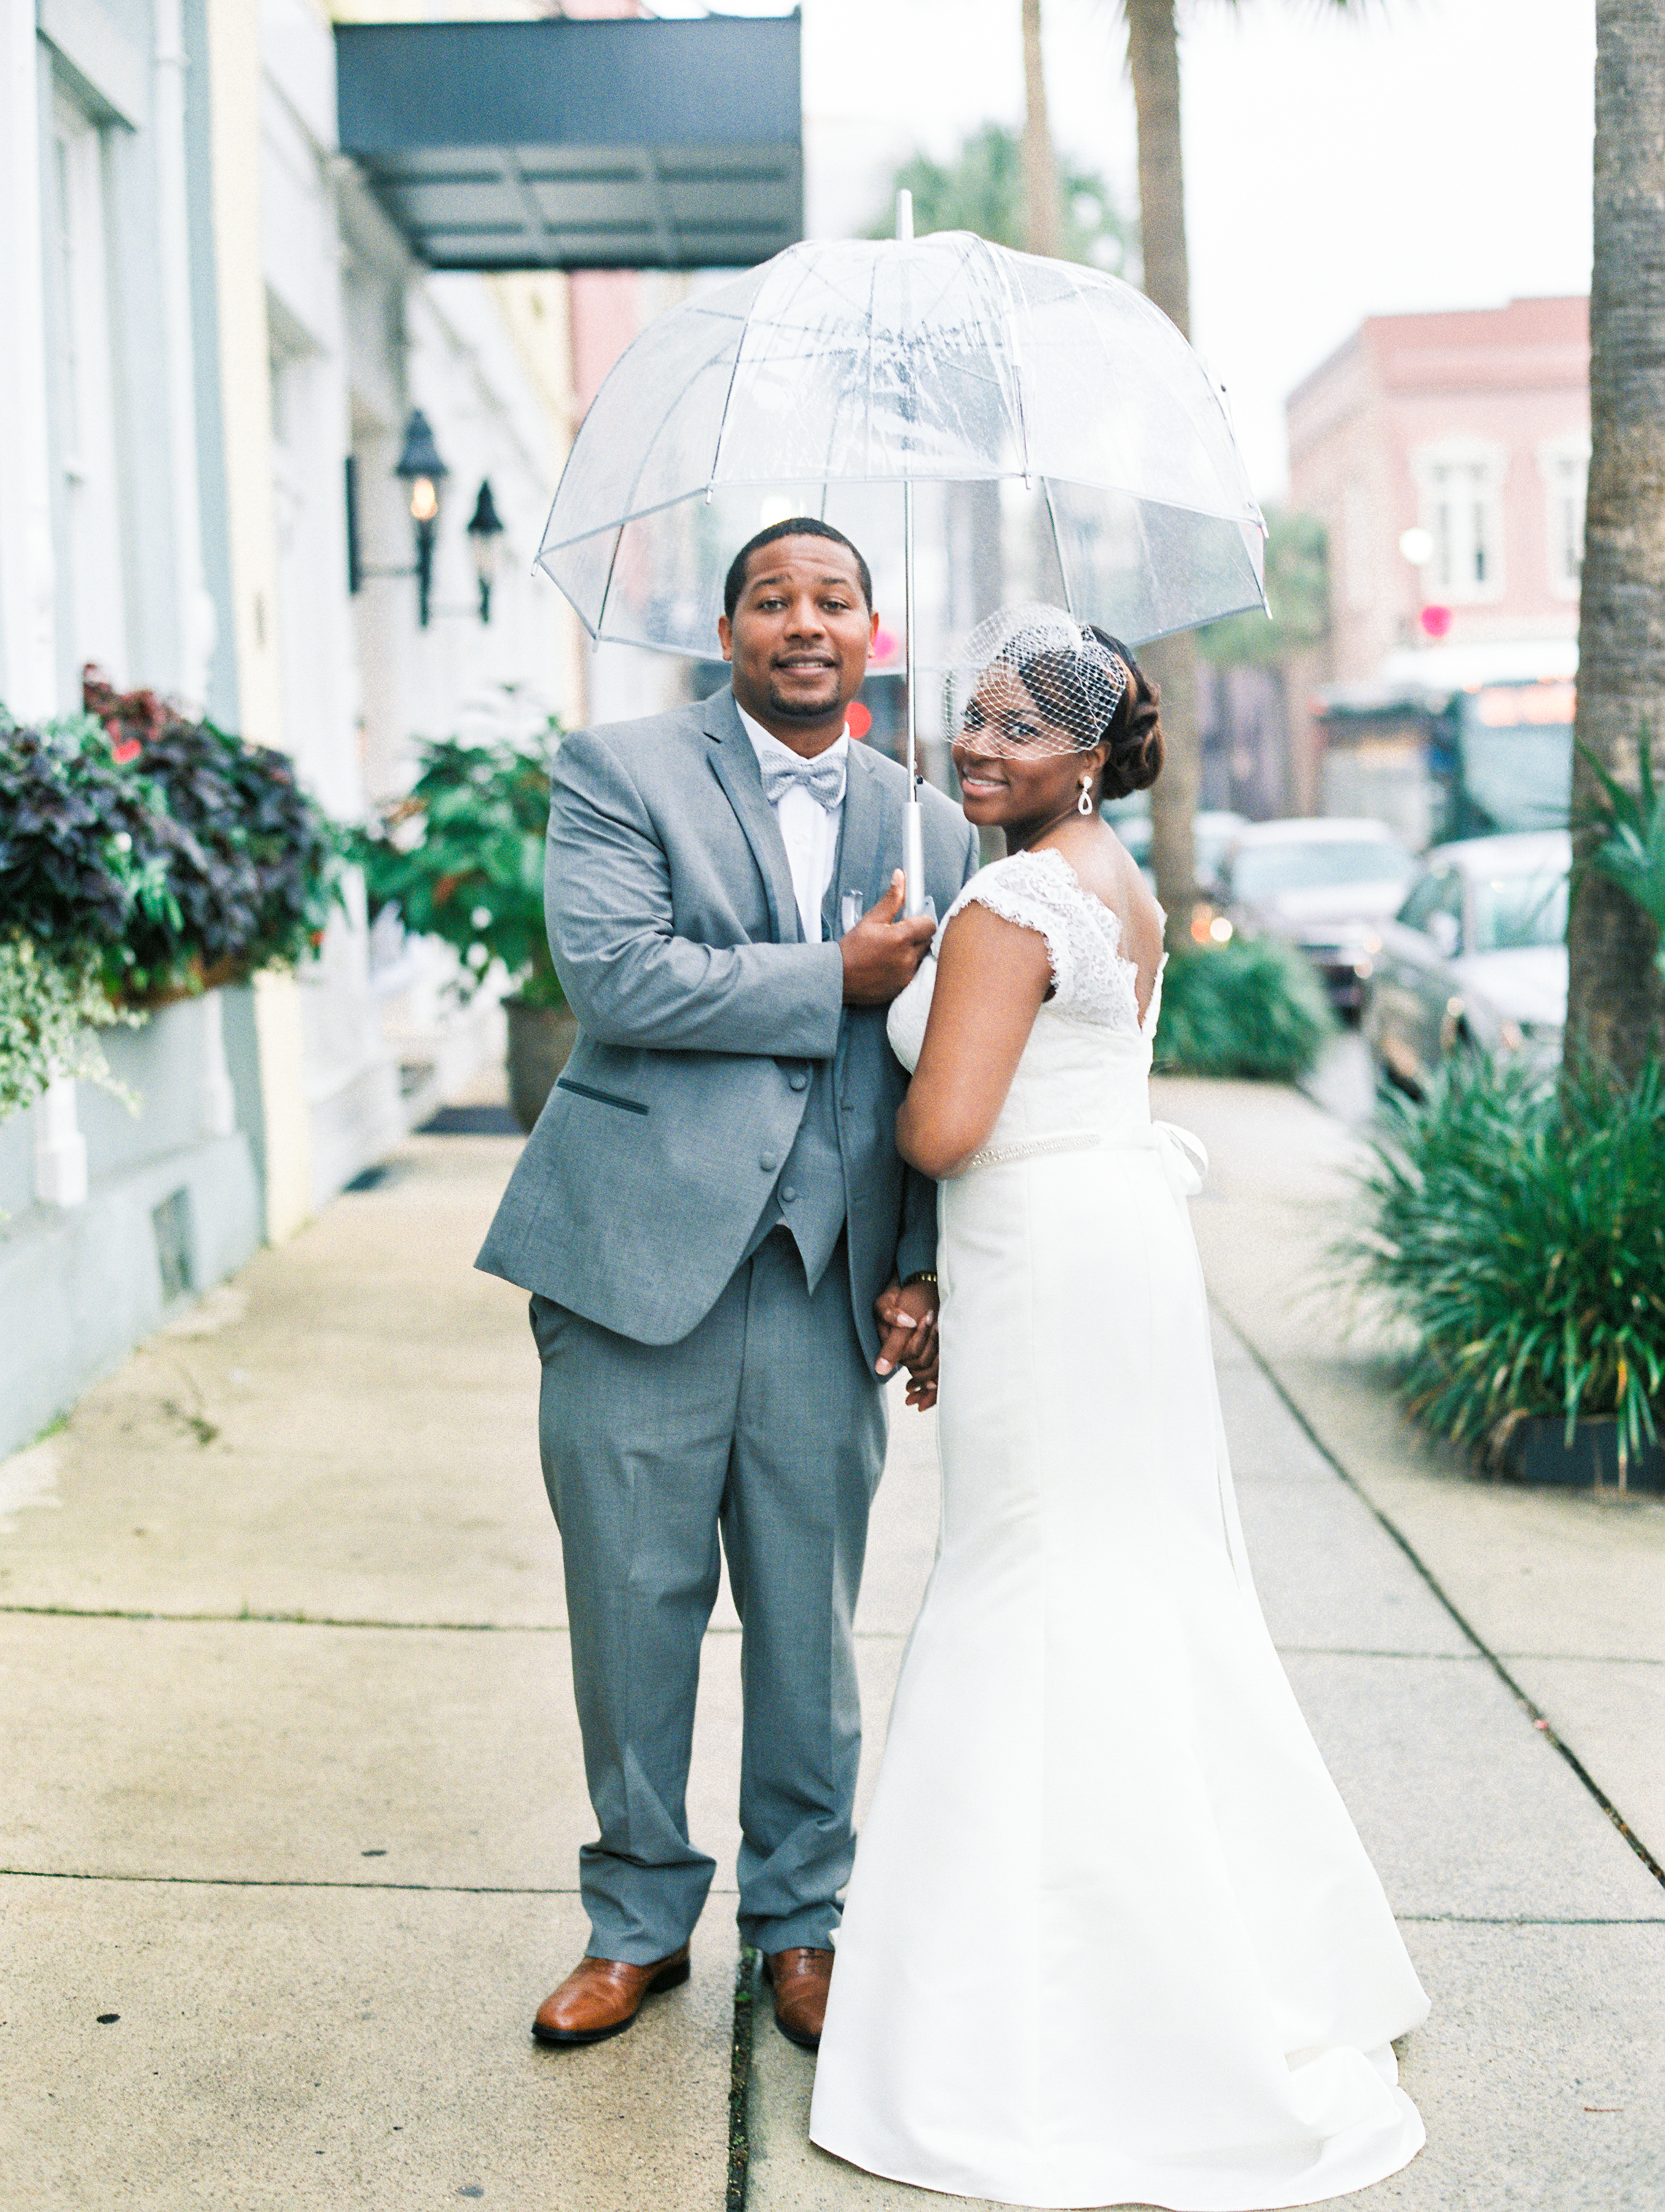 Downtown Charleston Elopement Pop-Up Wedding Planners, The Vendue, Scarlet Plan & Design Film (68).jpg